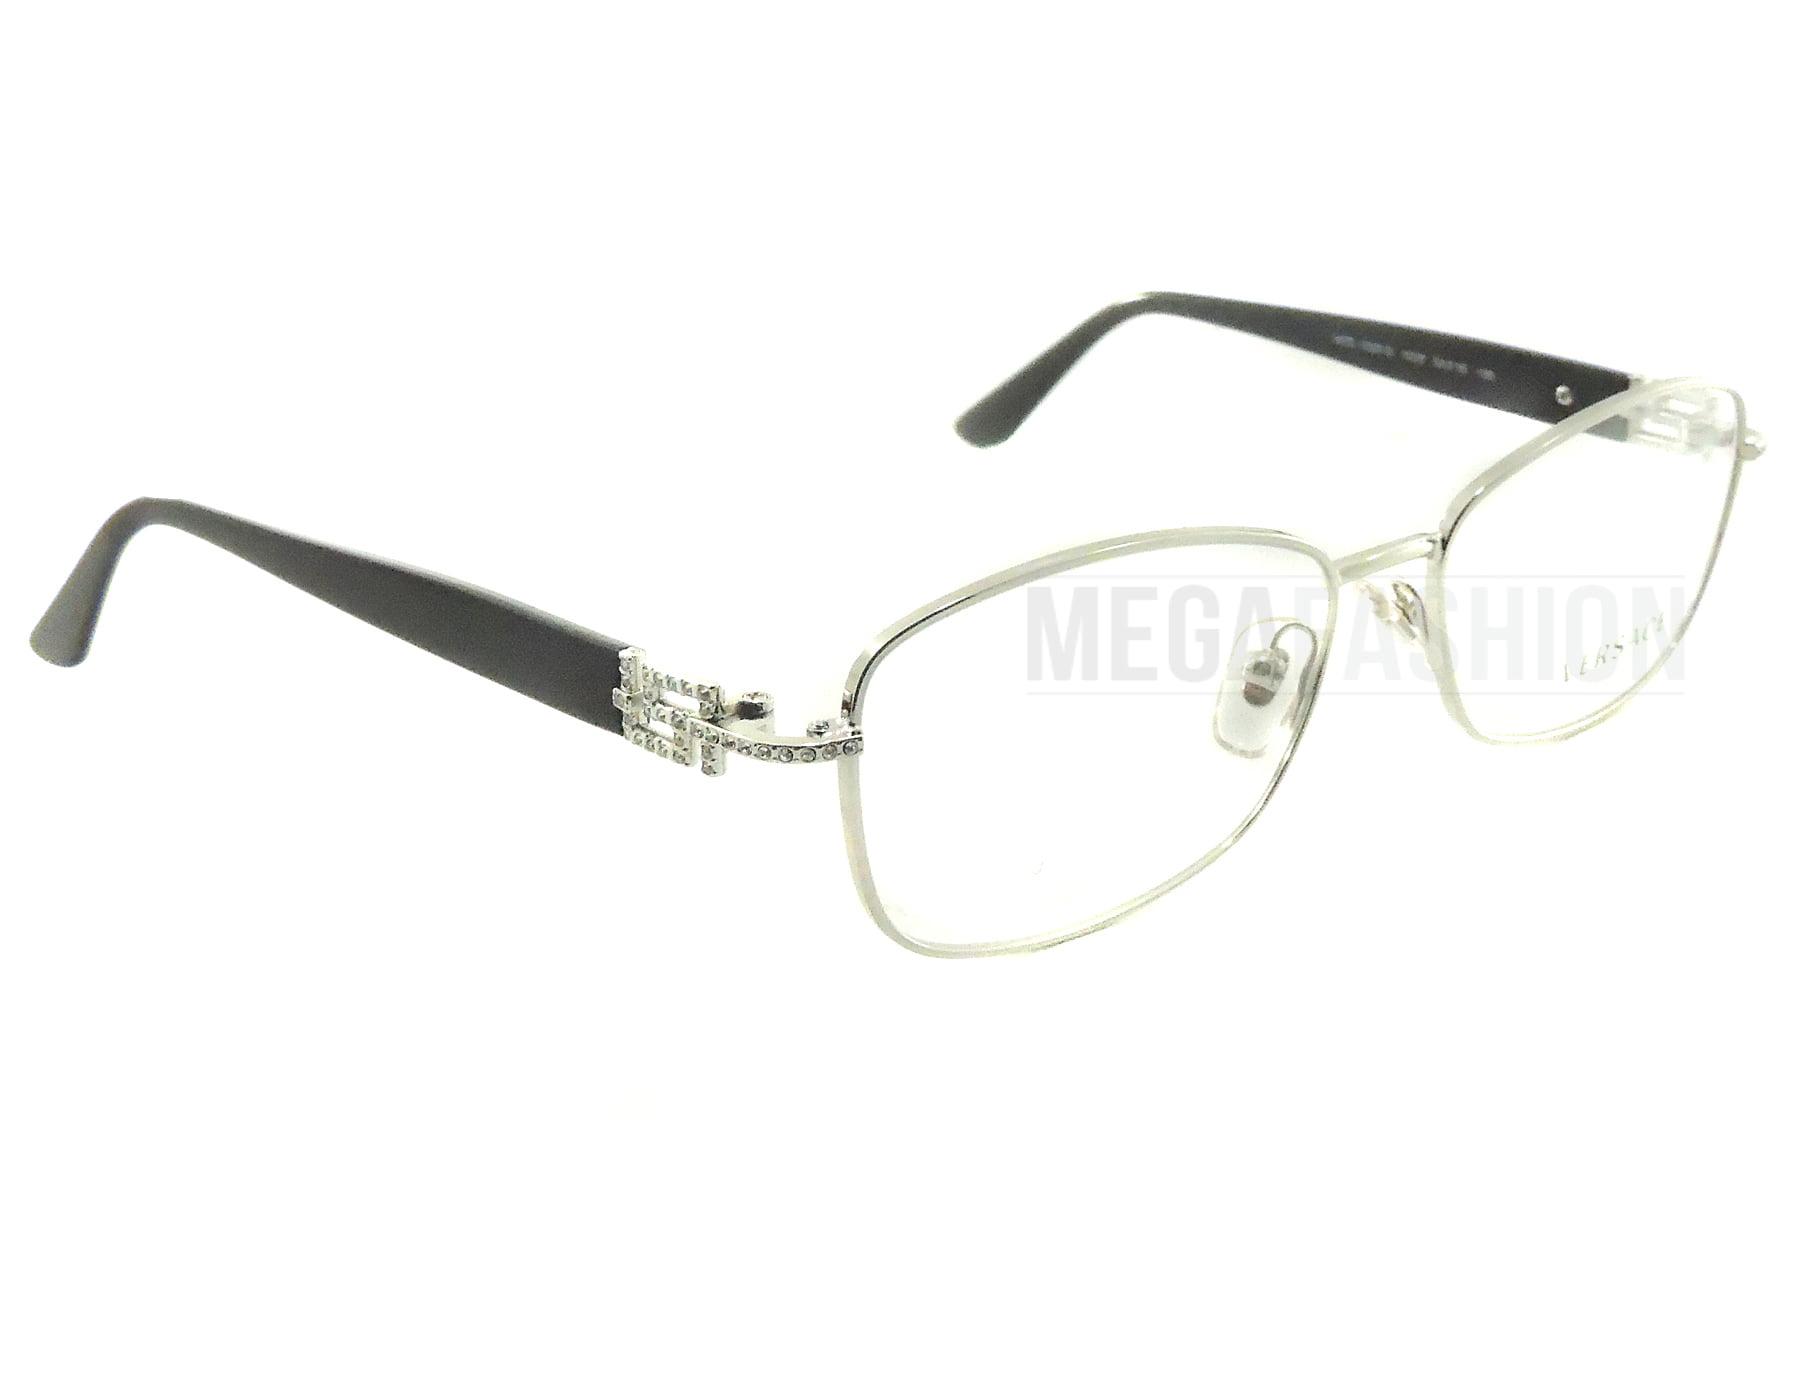 63a4c19a8f3cd Authentic Versace Eyeglasses VE1226B 1000 Silver Black Frames 52mm Rx-ABLE